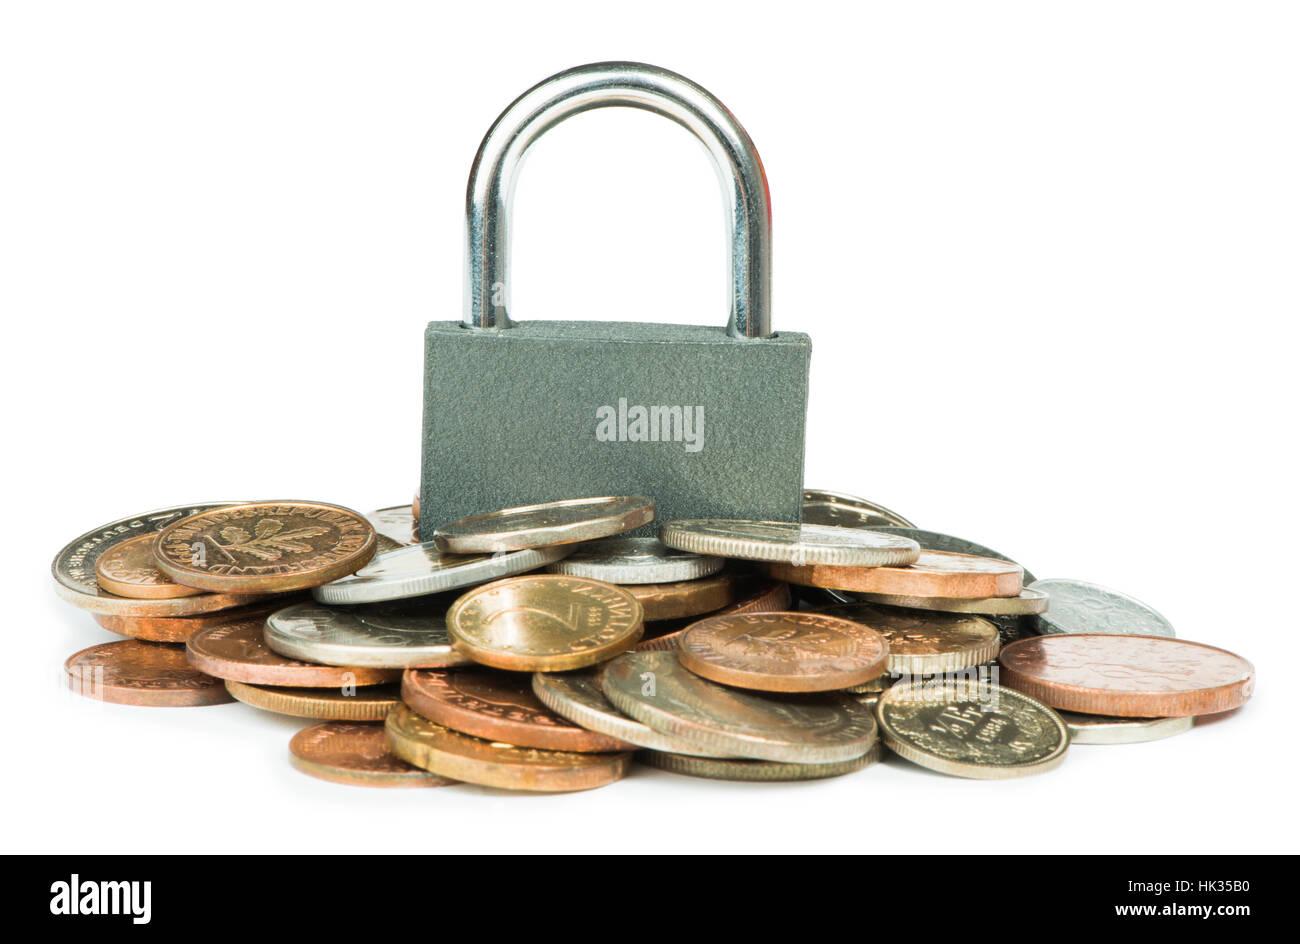 lock, bank, lending institution, protected, sheltered, isolated, model, design, - Stock Image